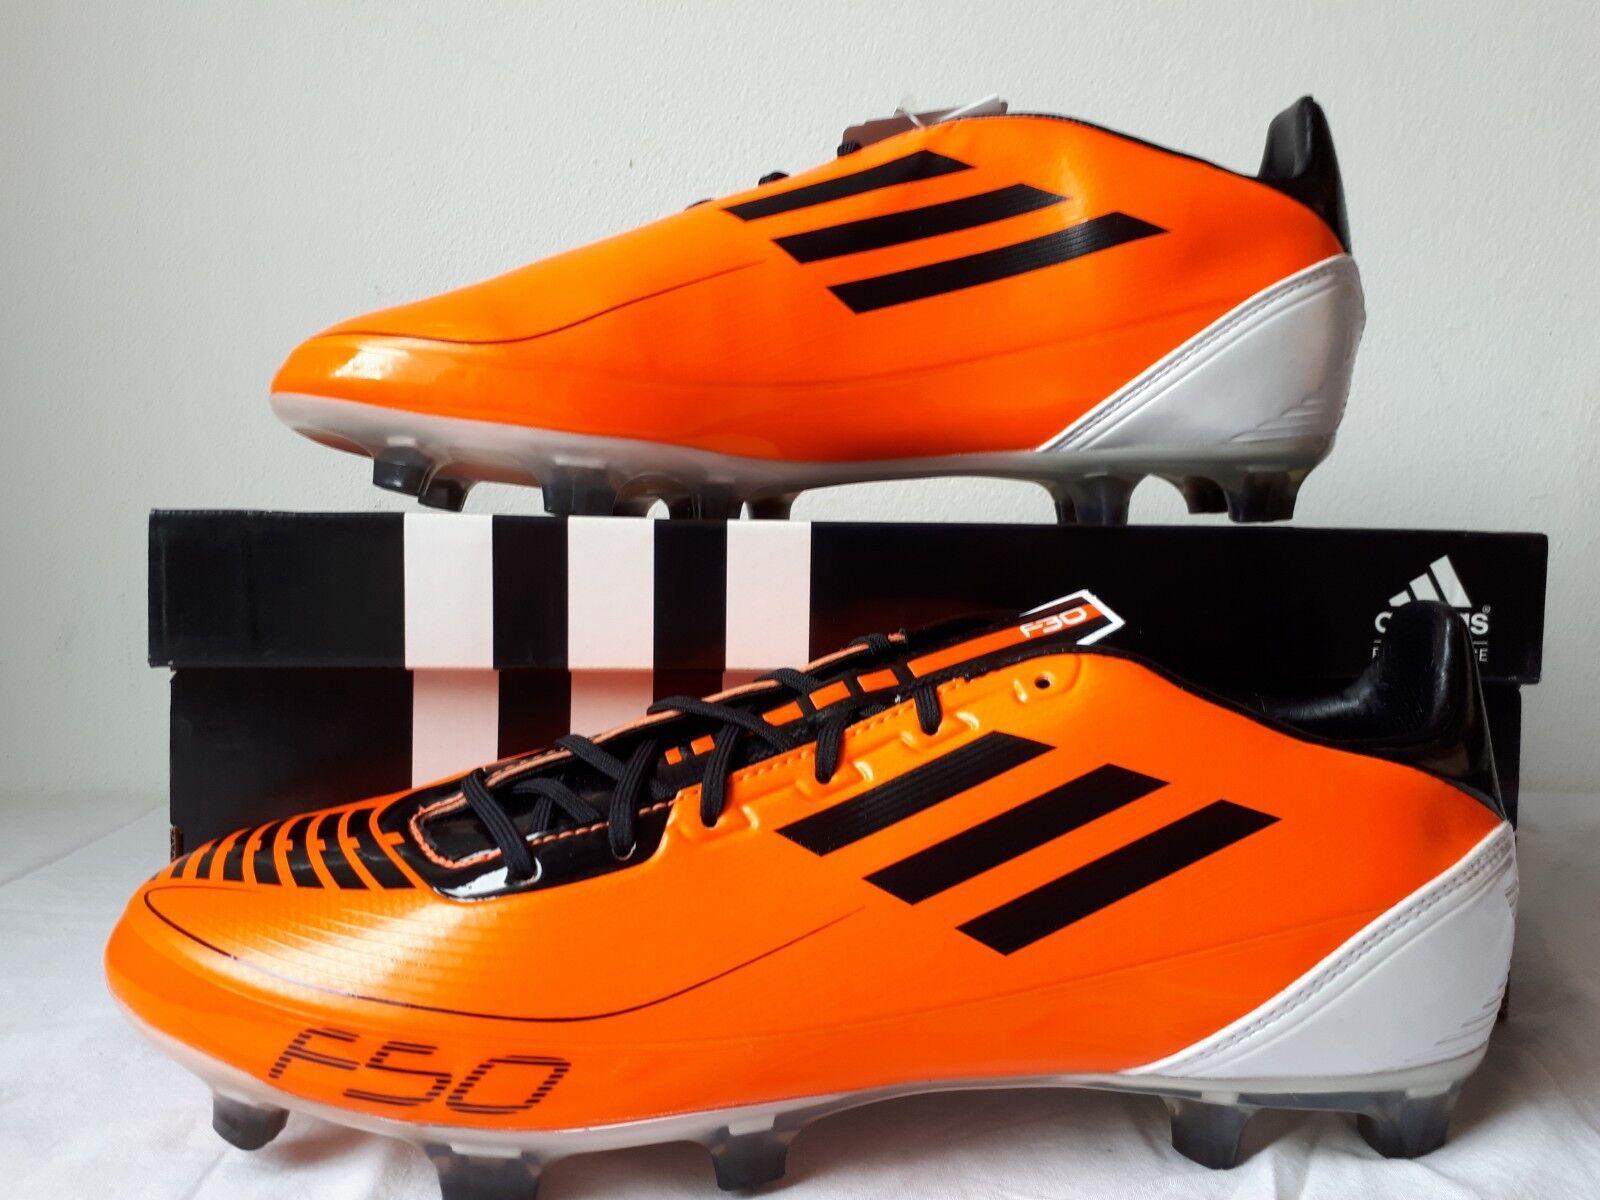 ADIDAS F30 TRX FG [U44249]shoes calcio-football boots-fussballschuhe